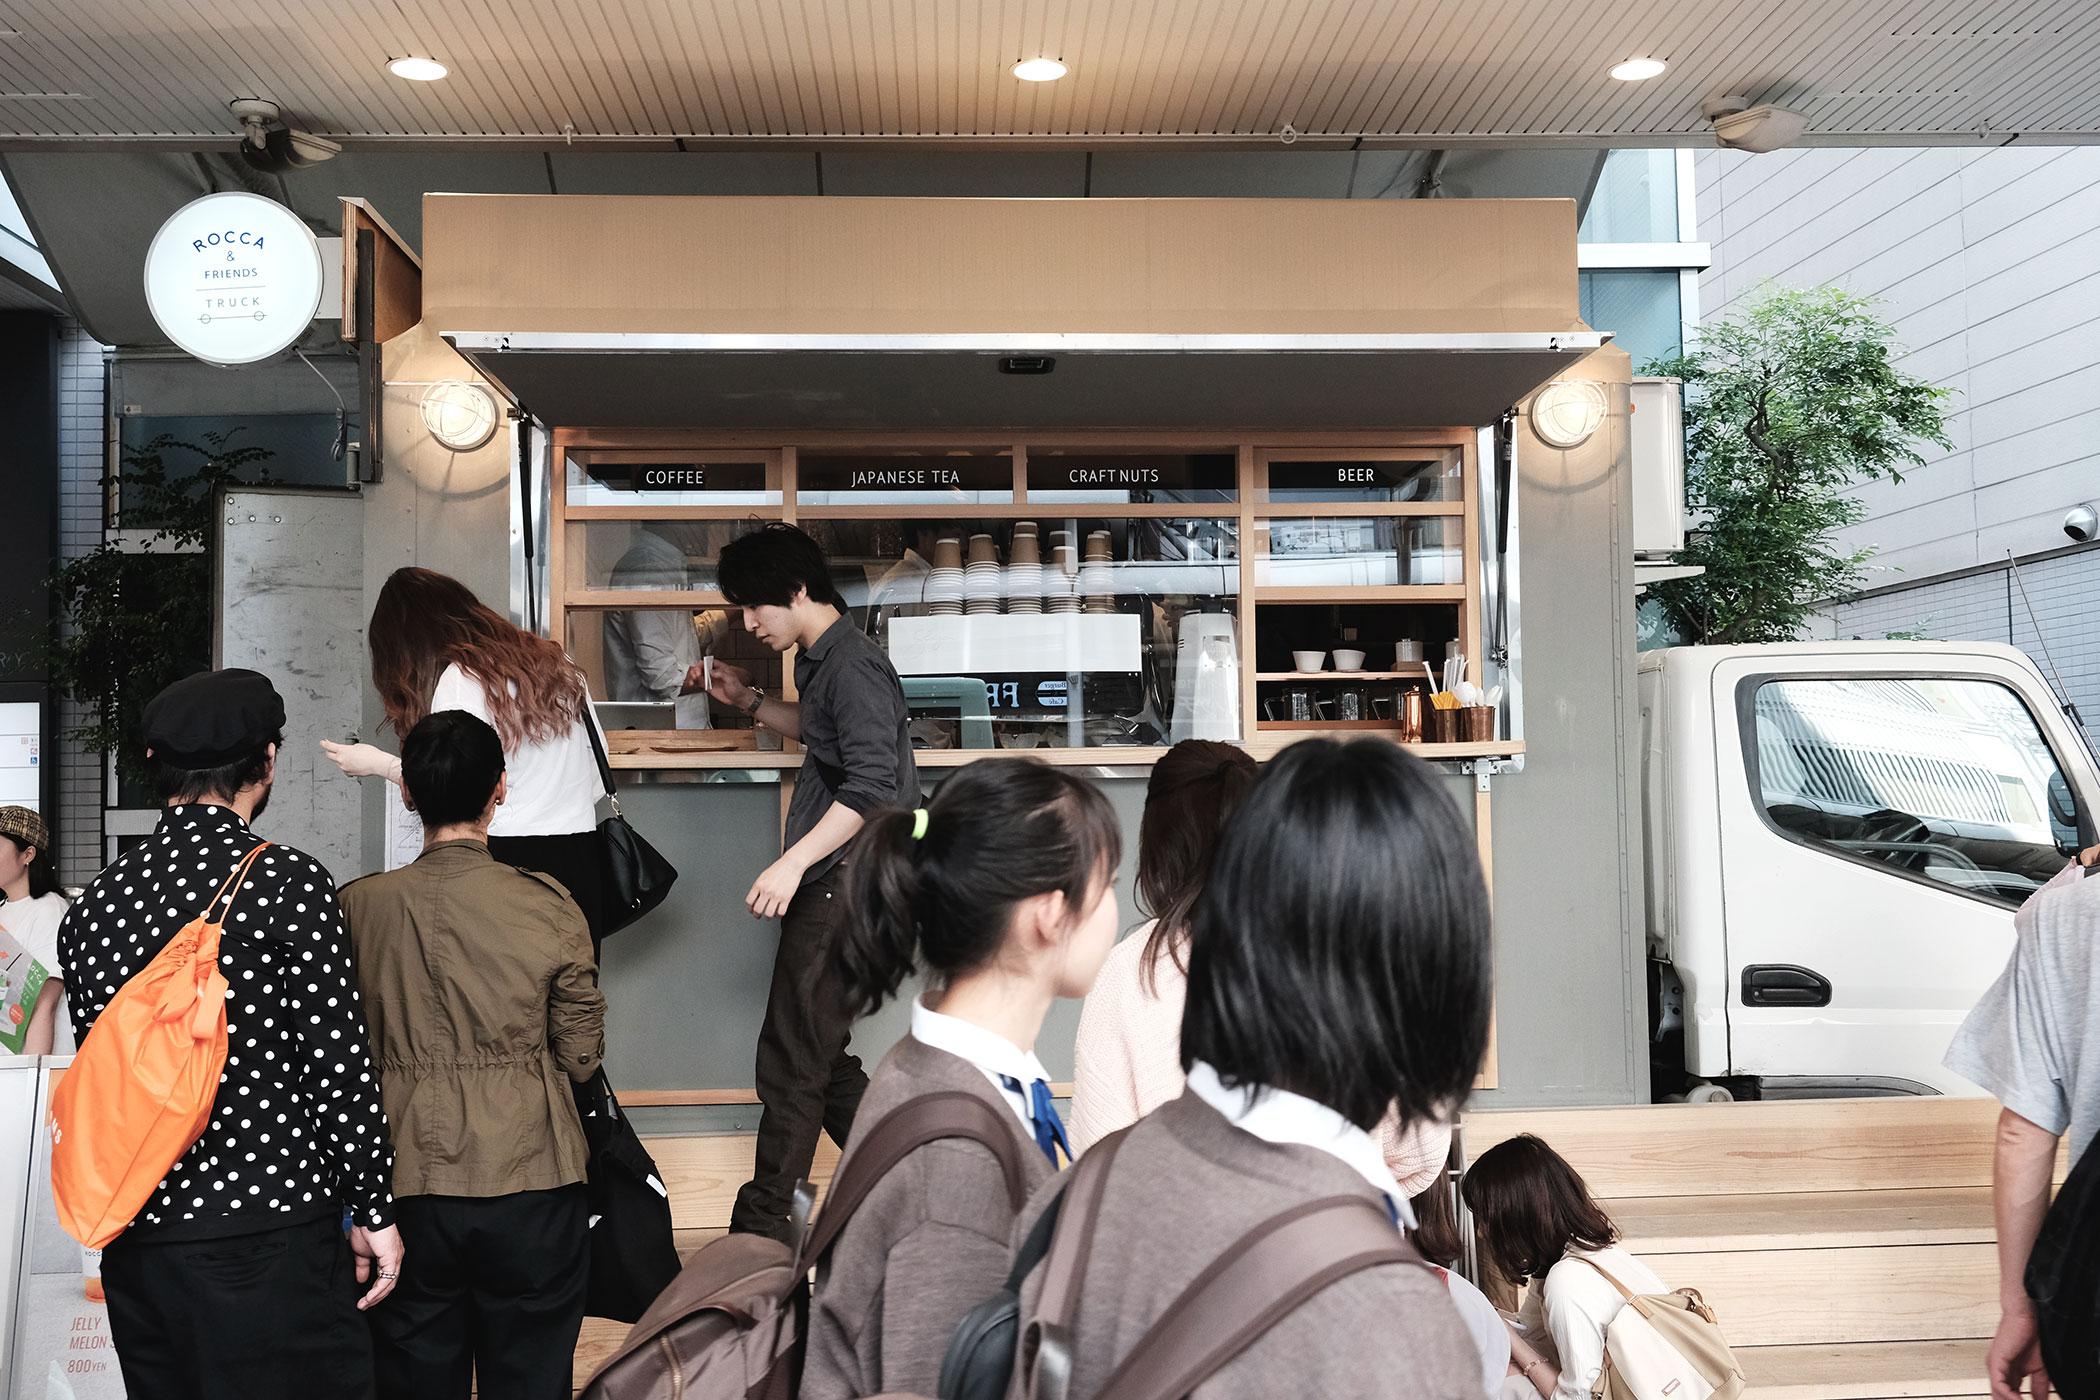 ROCCA&FRIENDS TRUCK 京都の景色をイメージしたドリンクはついつい撮りたくなる